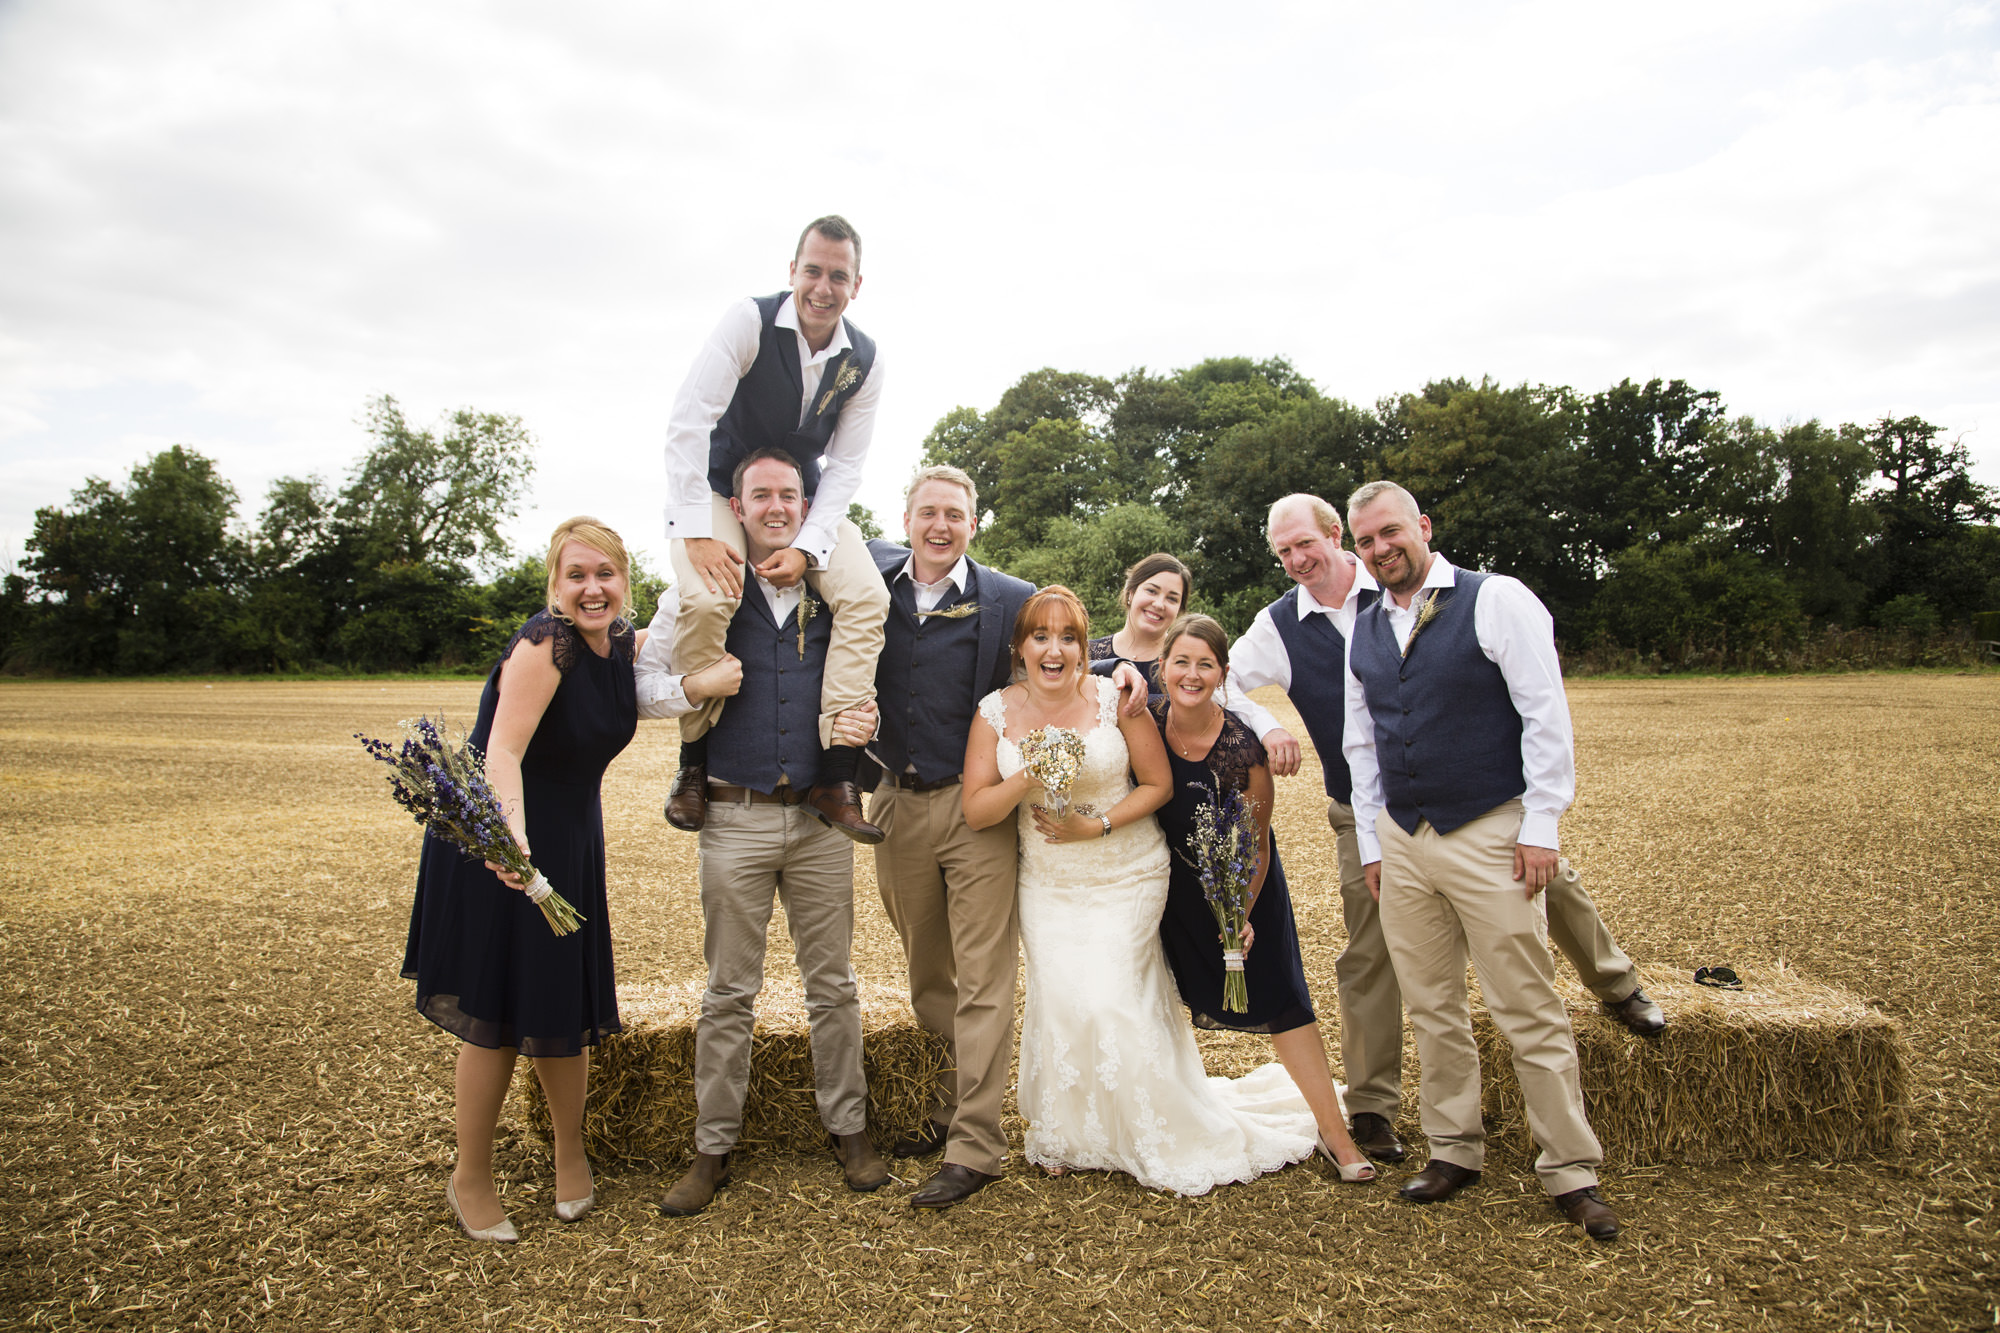 cambridge-wedding-photographer-io-1698-387.jpg